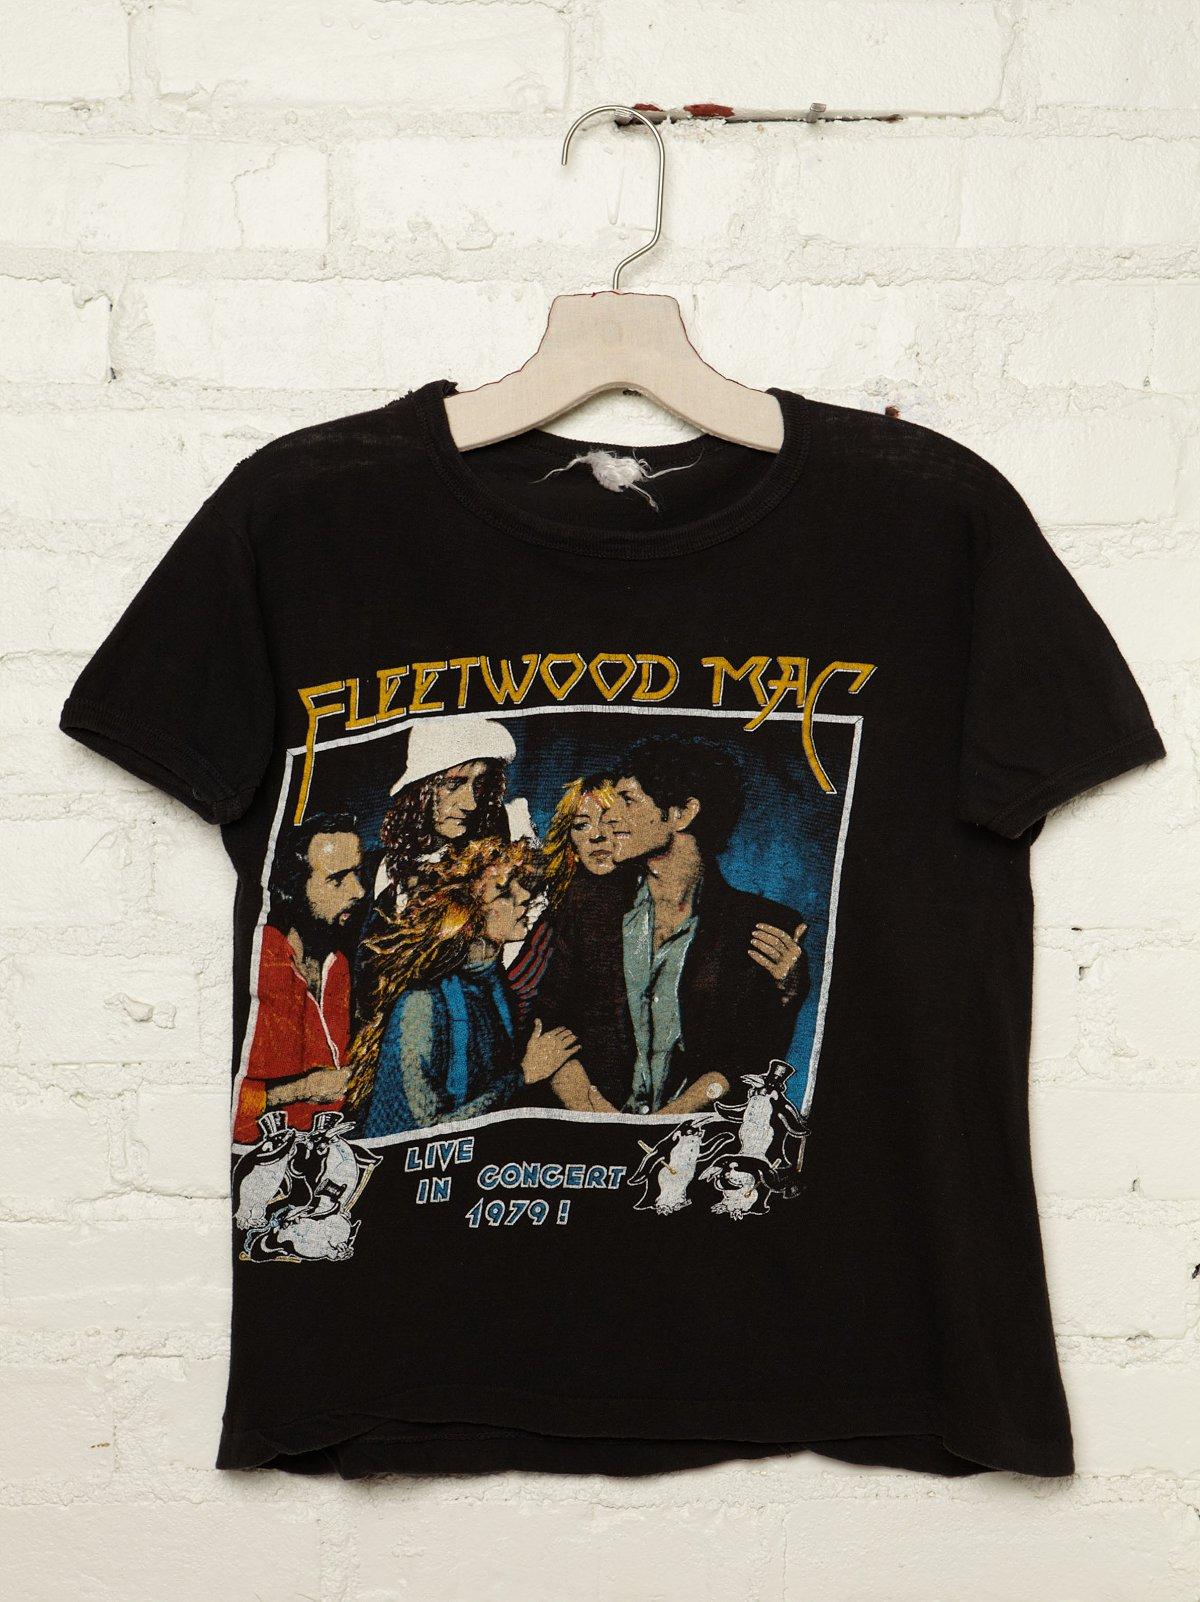 Vintage Fleetwood Mac 1979 Tee